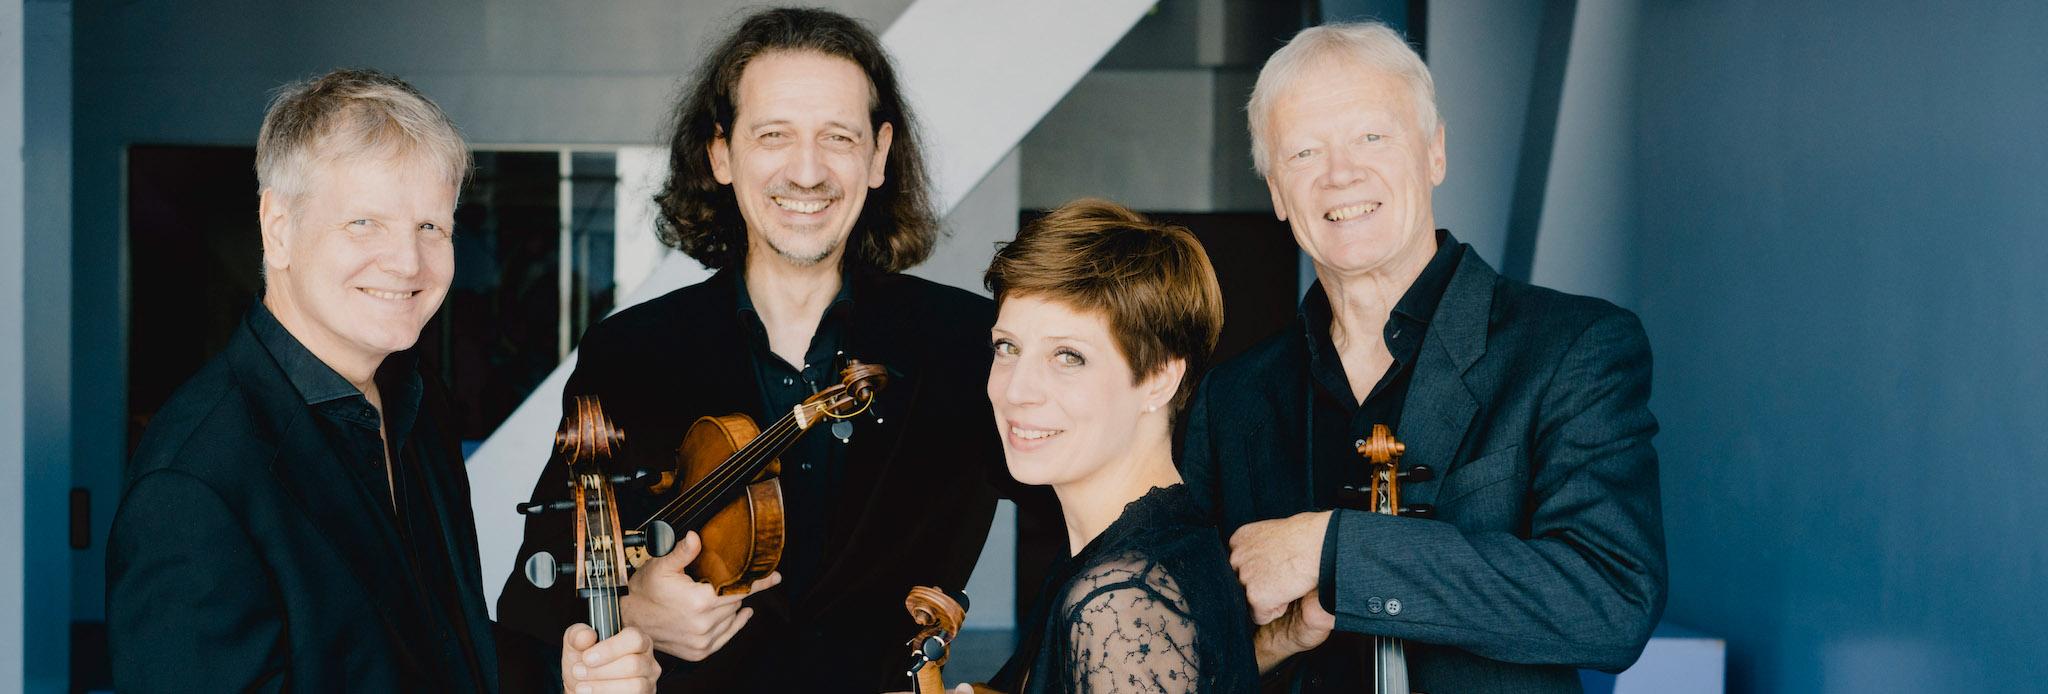 Schuppanzigh-Quartett